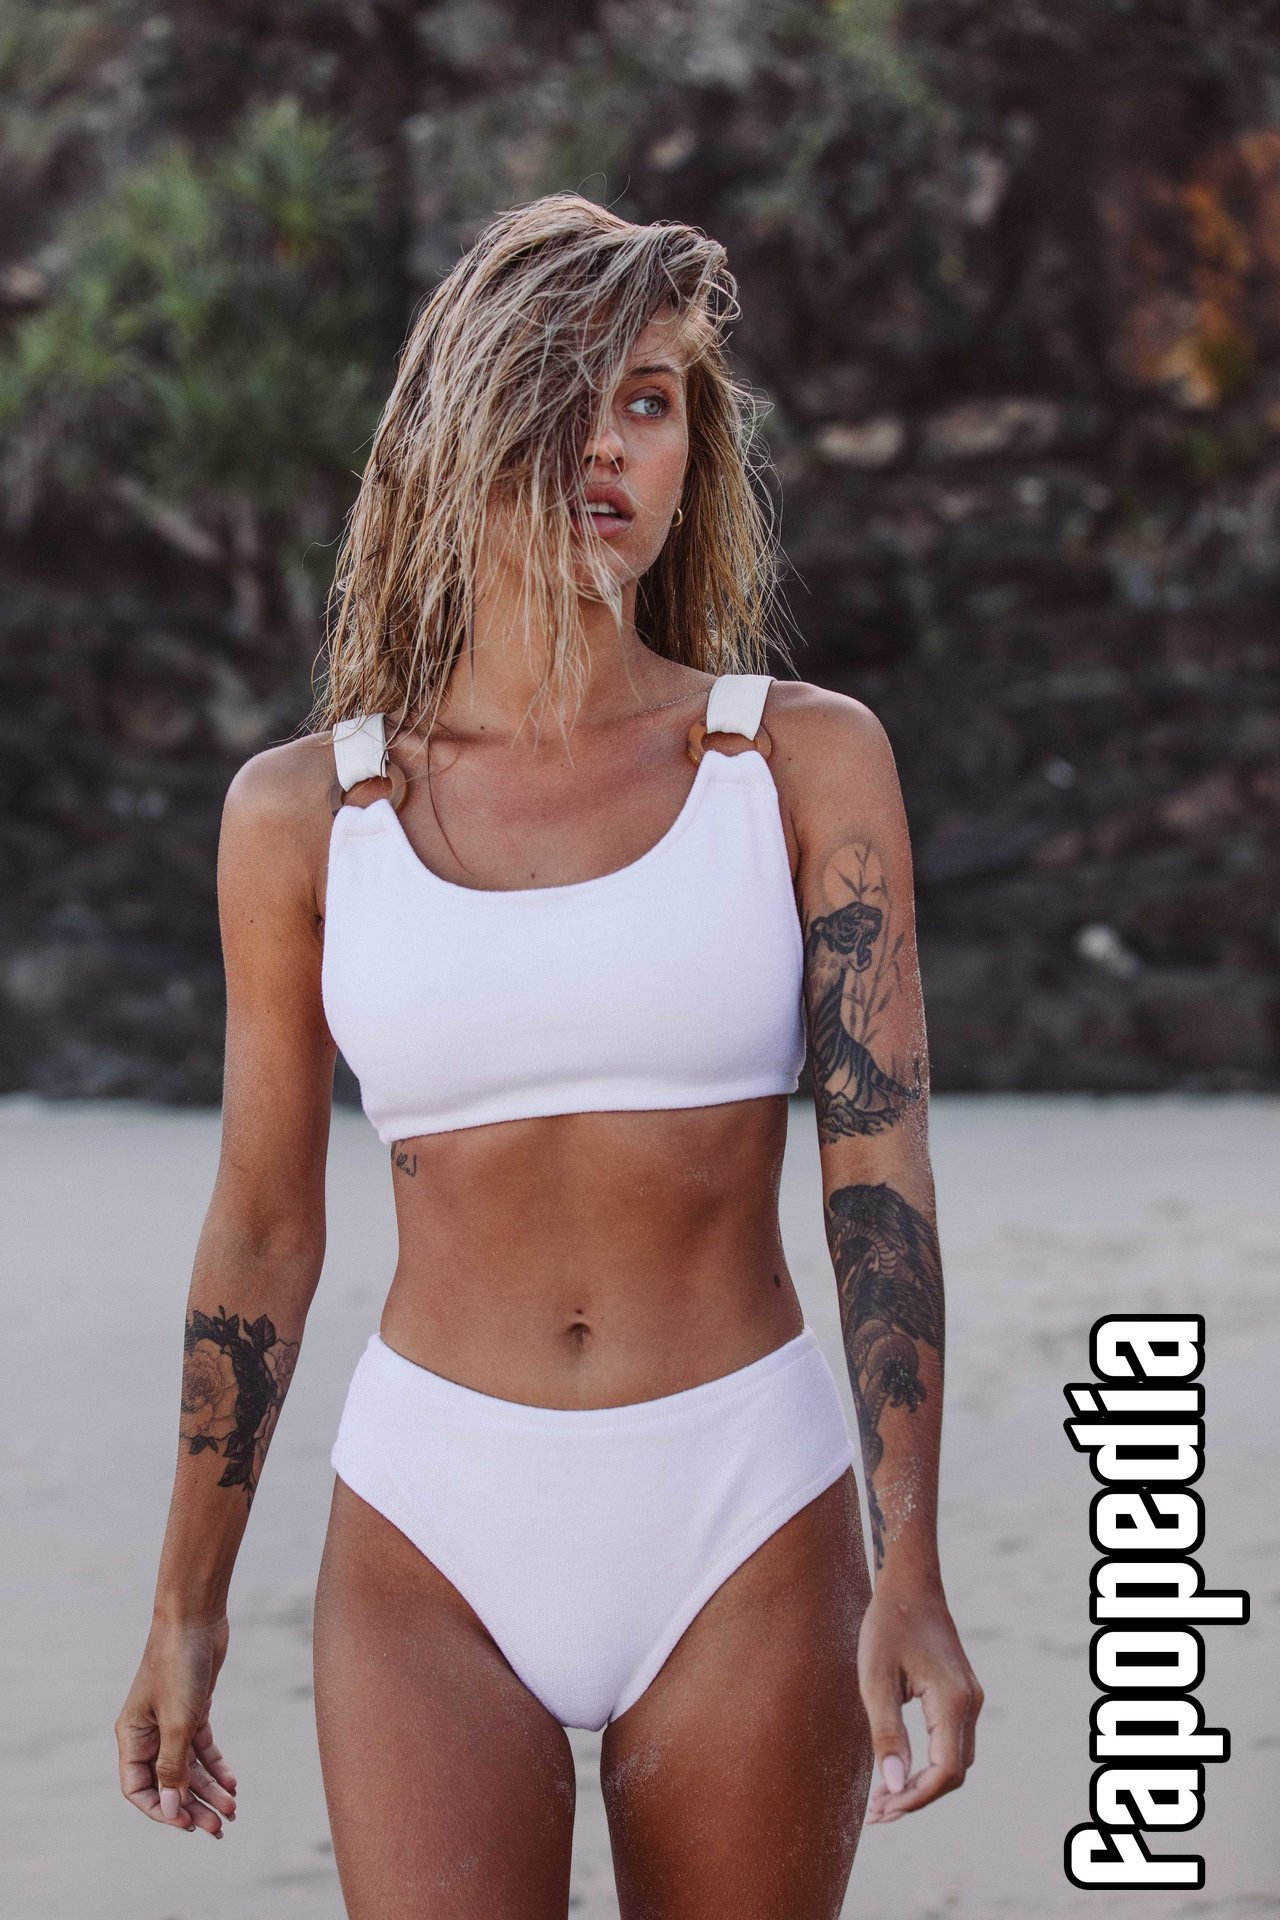 Cathlin Ulrichsen Nude Leaks